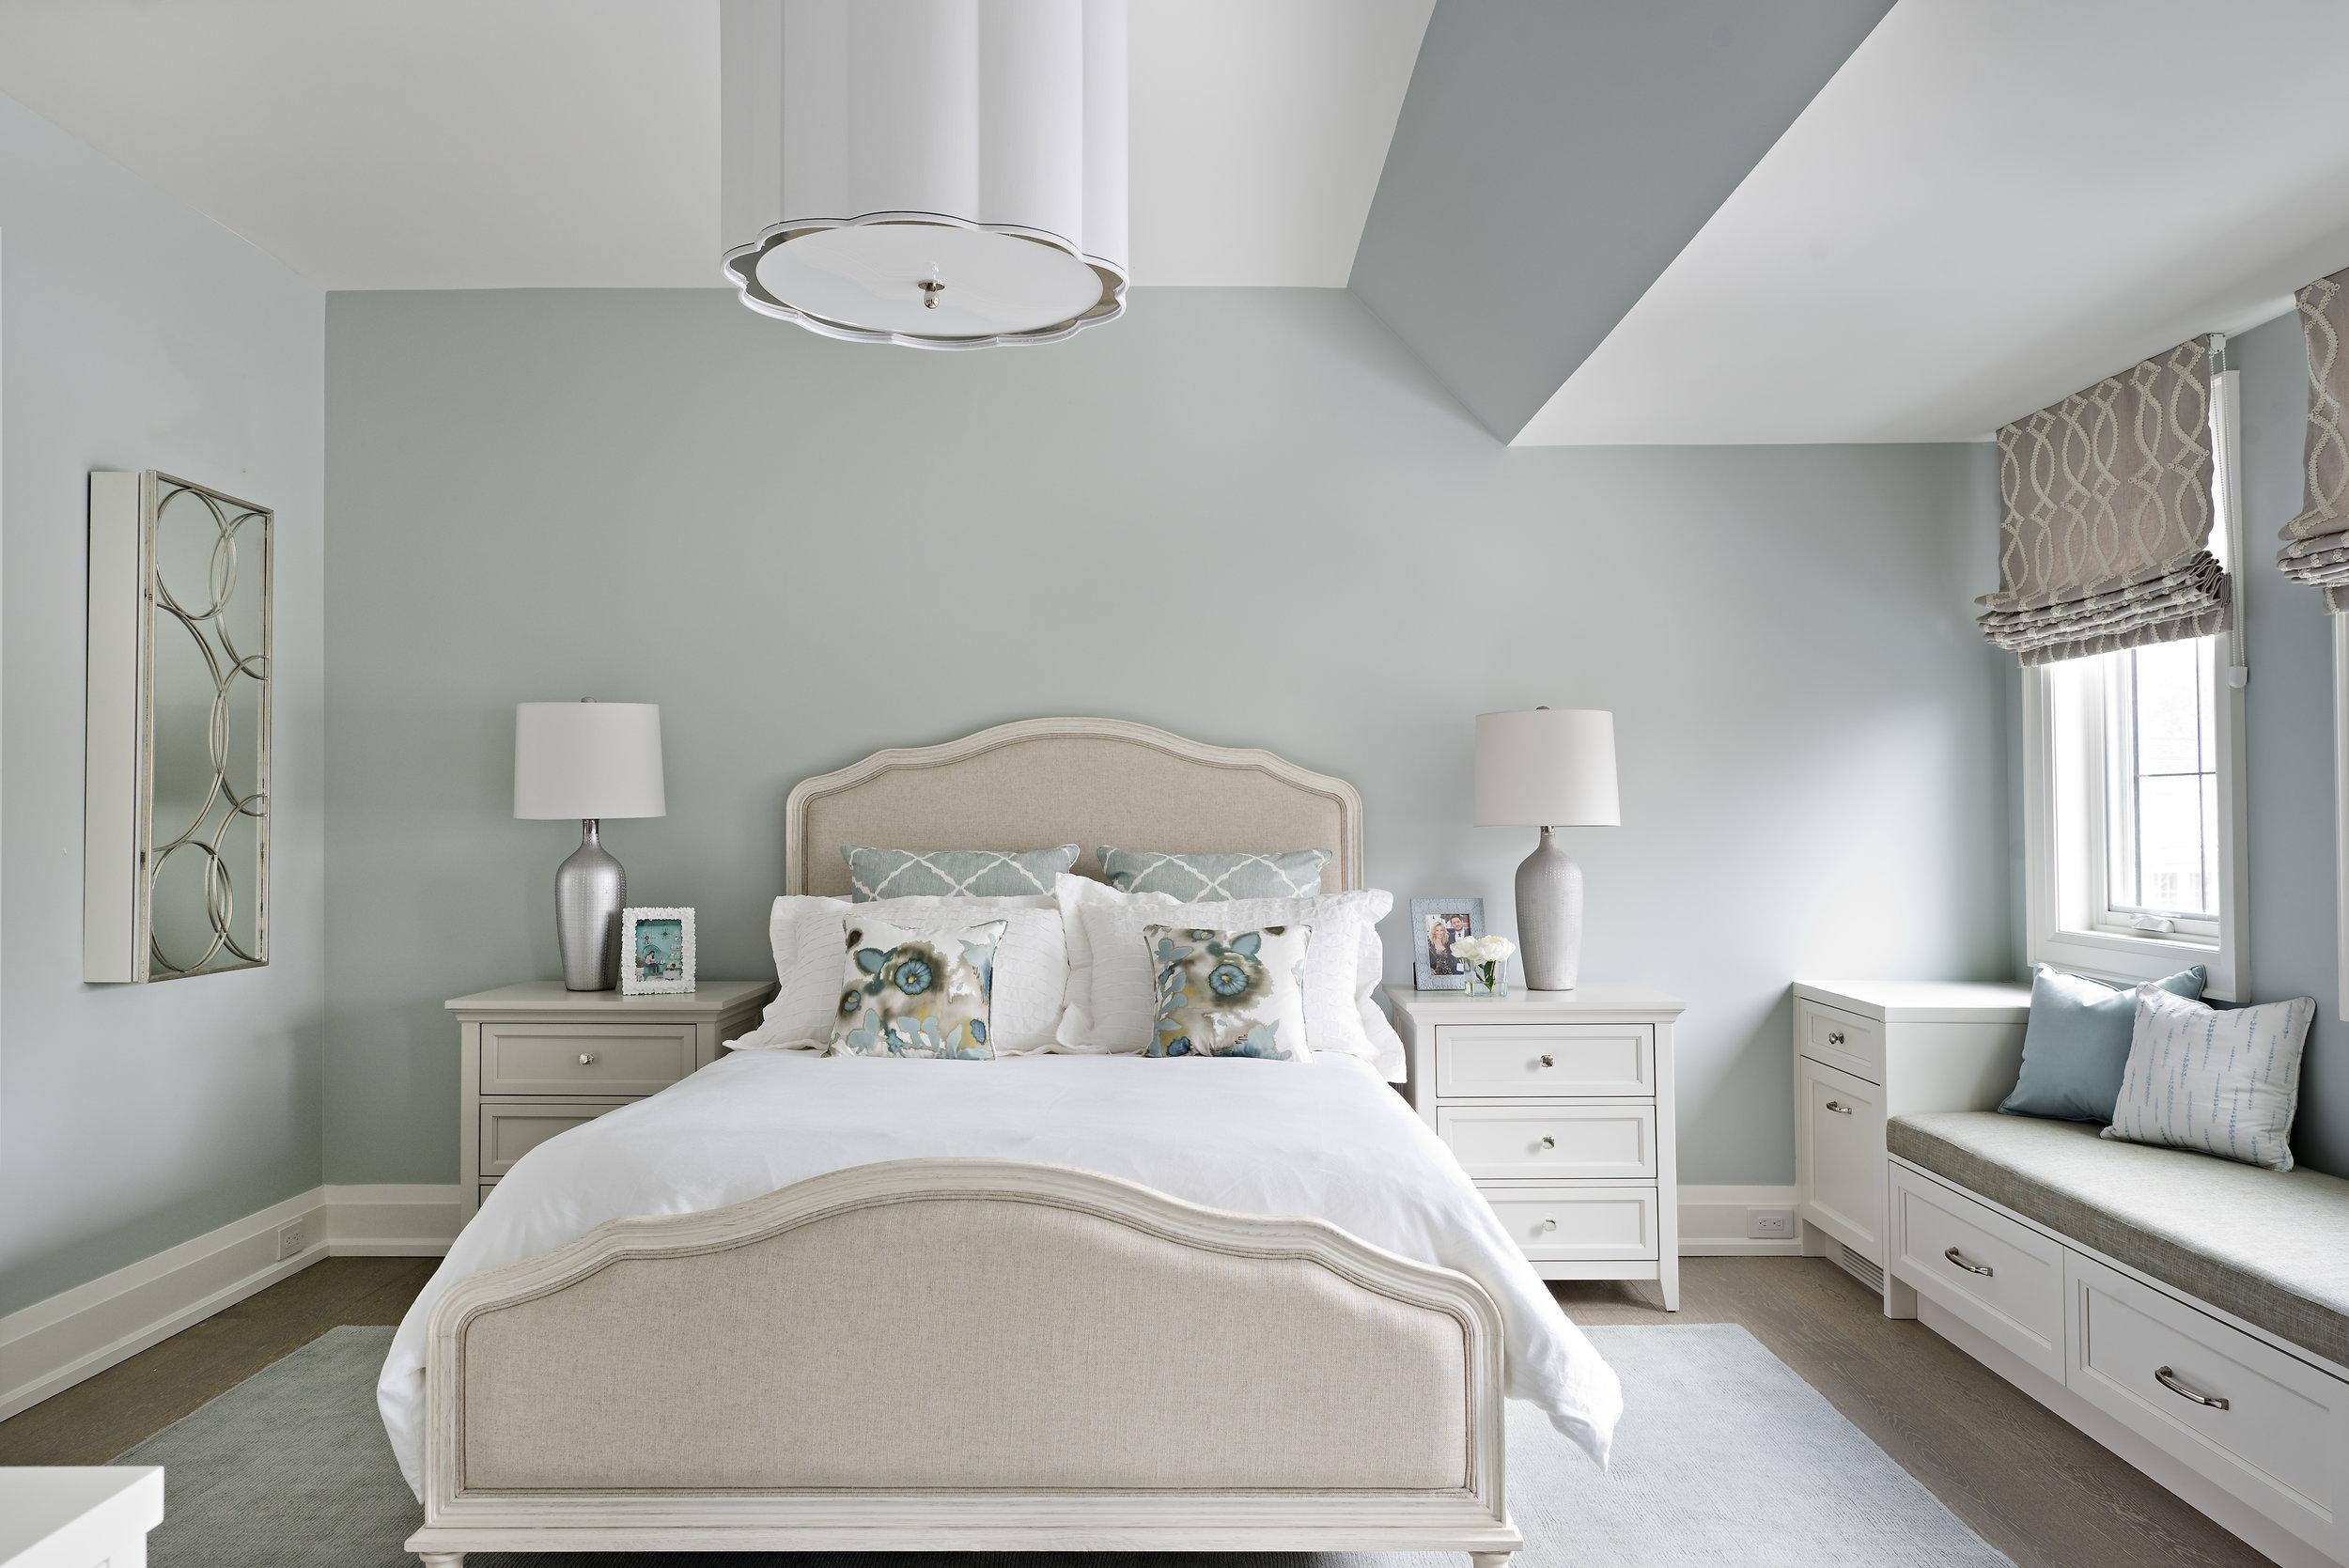 Interior Designer Pizzale Design Bright Girls Bedroom Teal Wall Custom MIllwork Details.jpg